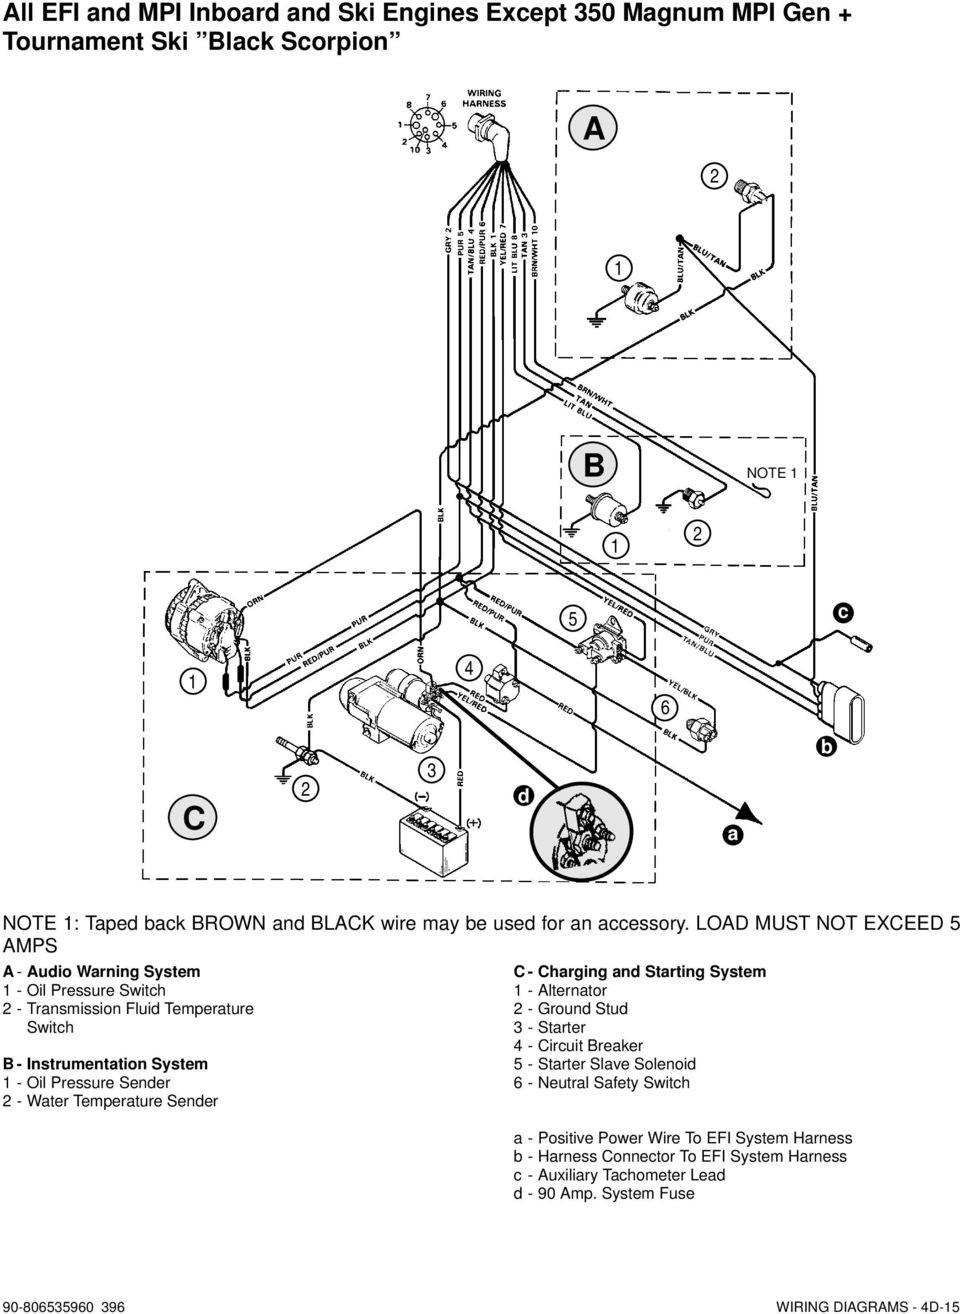 powerline alternator wiring diagram blog wiring diagram Voltage Regulator powerline alternator wiring diagram simple wiring diagram site powerline speed and marine powerline alternator wiring diagram